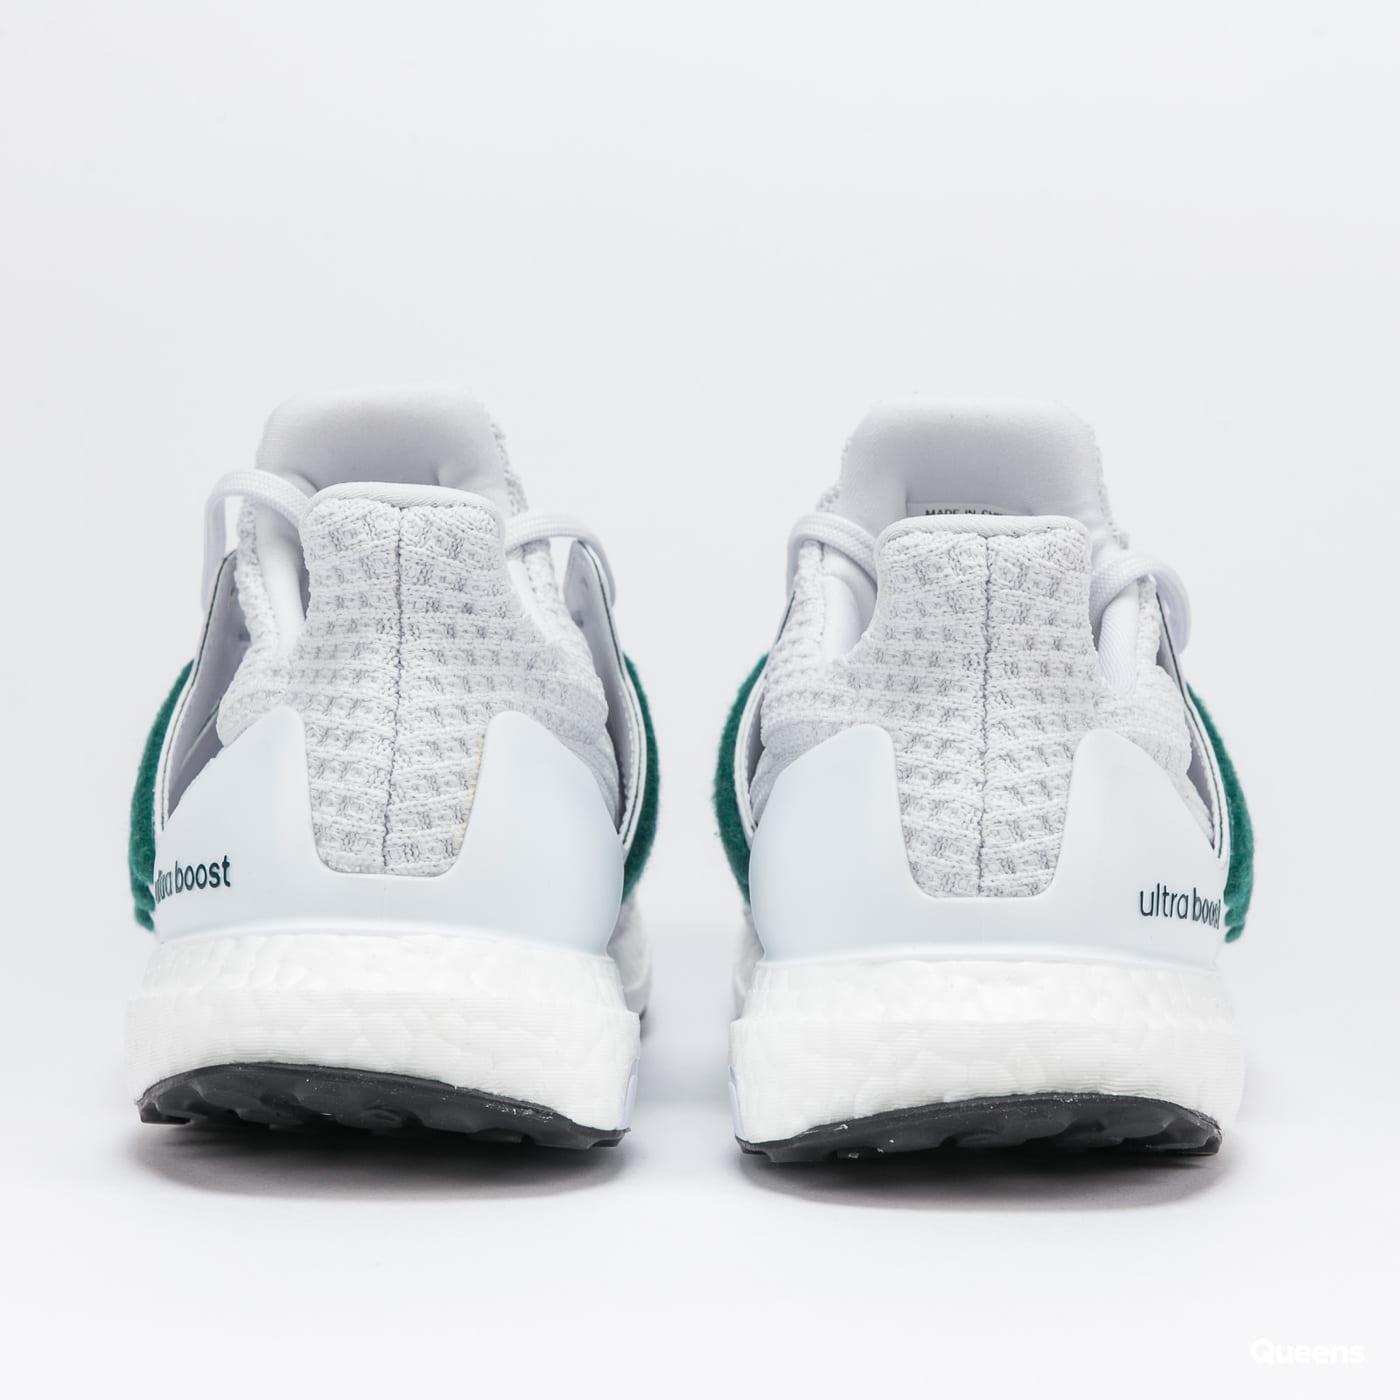 adidas Performance UltraBoost 4.0 DNA ftwwht / cgreen / cblack